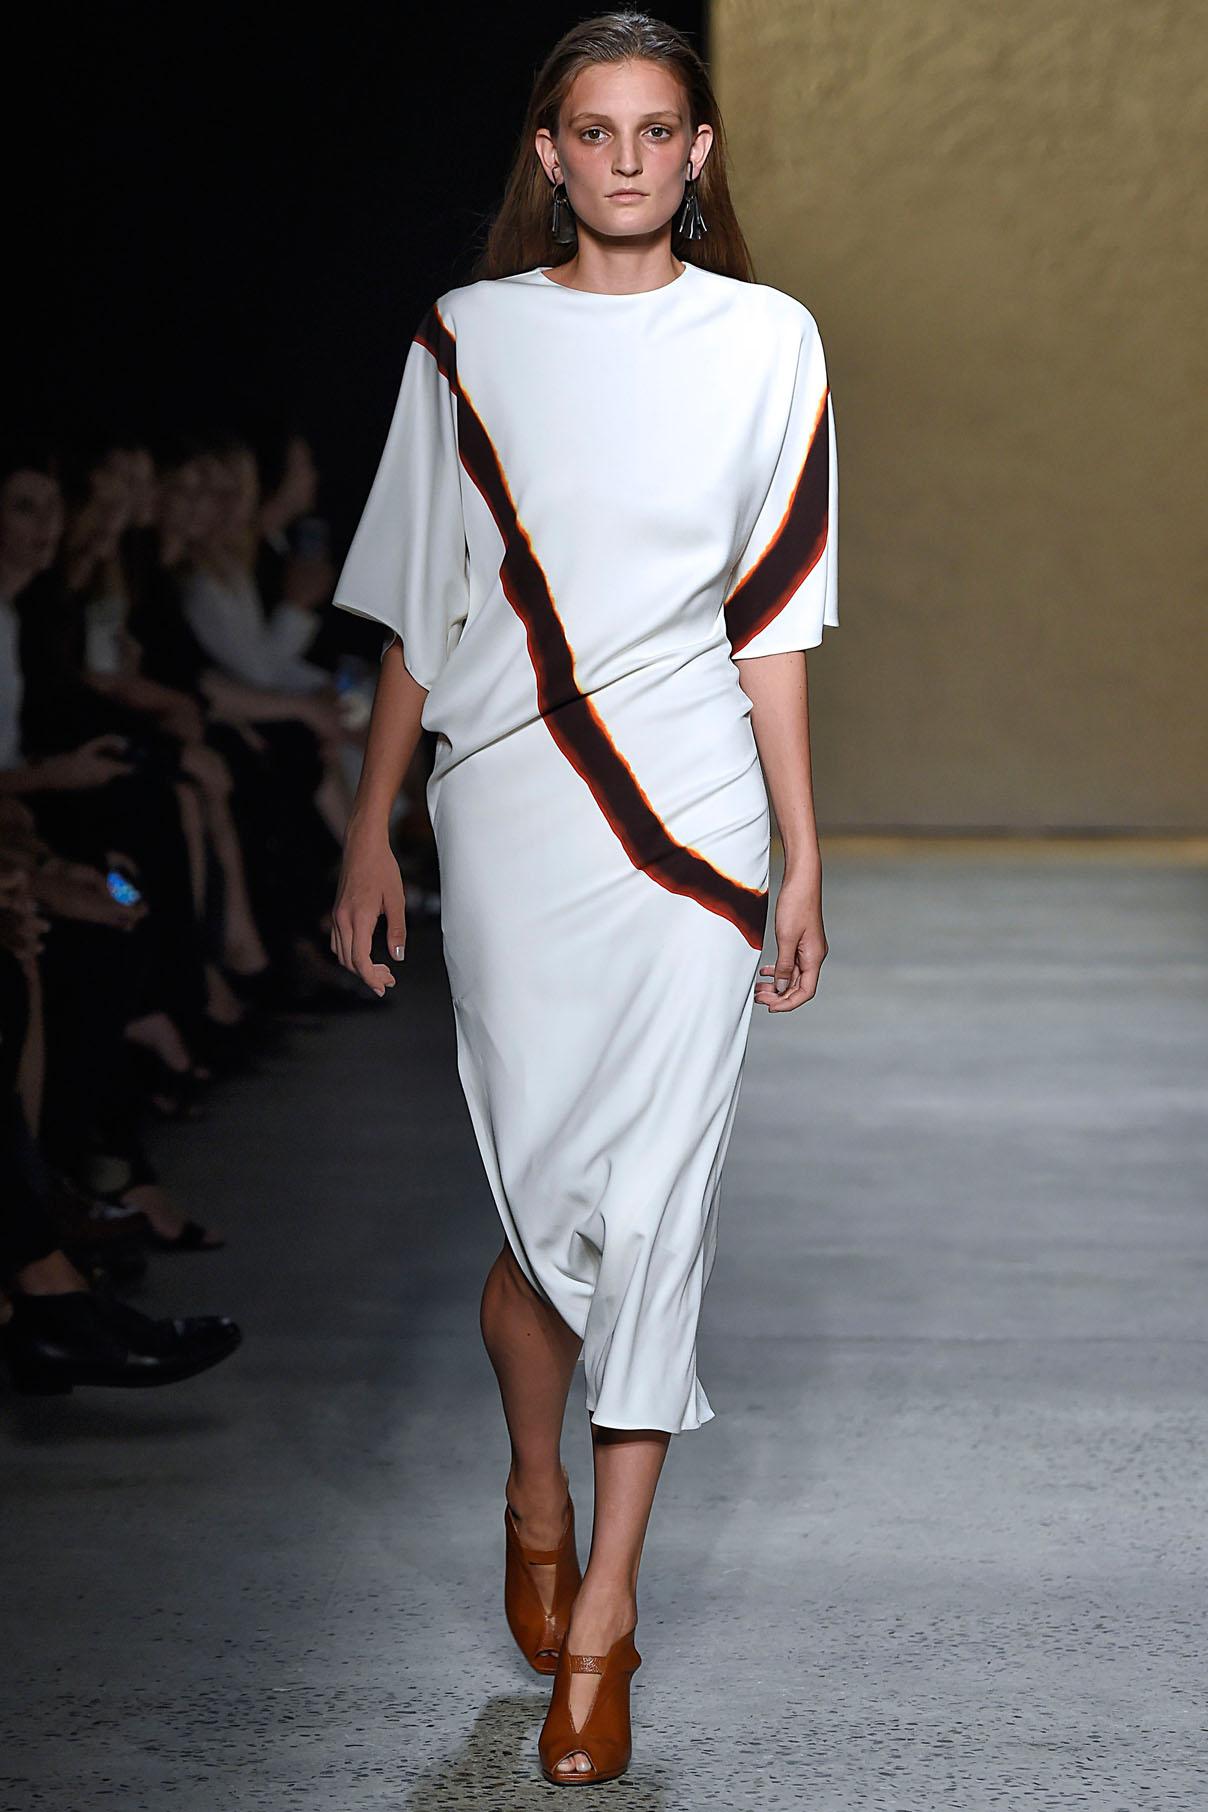 Look 21 Ebony/claret/white mineral dye print bias T-dress.